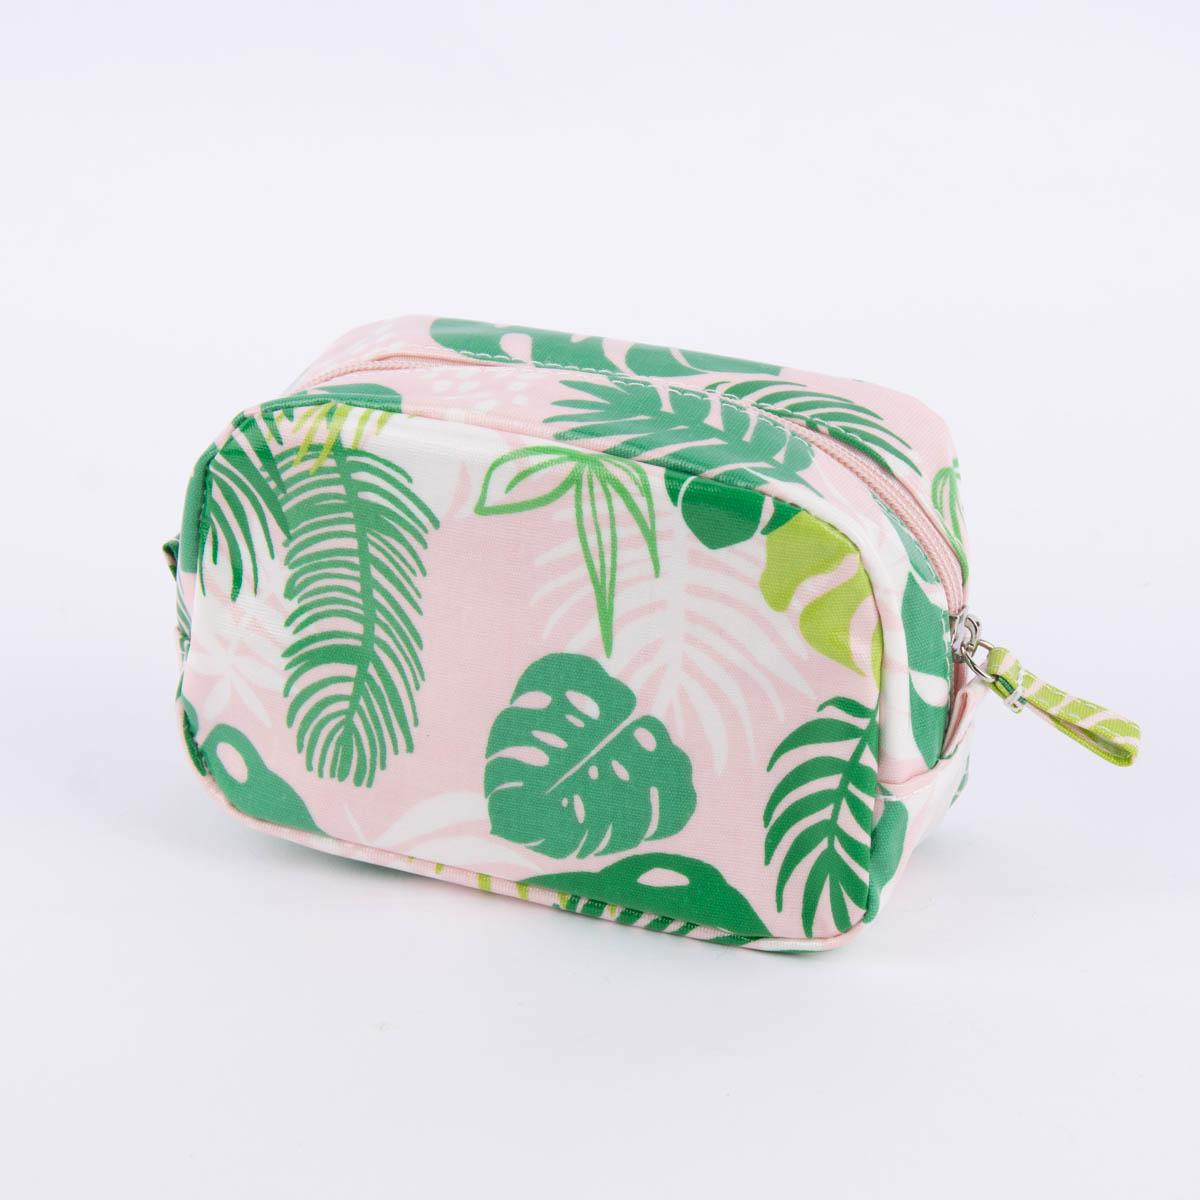 Kosmetiktasche Tropical Palms Rosa Grun 16x6x10cm Wohnen